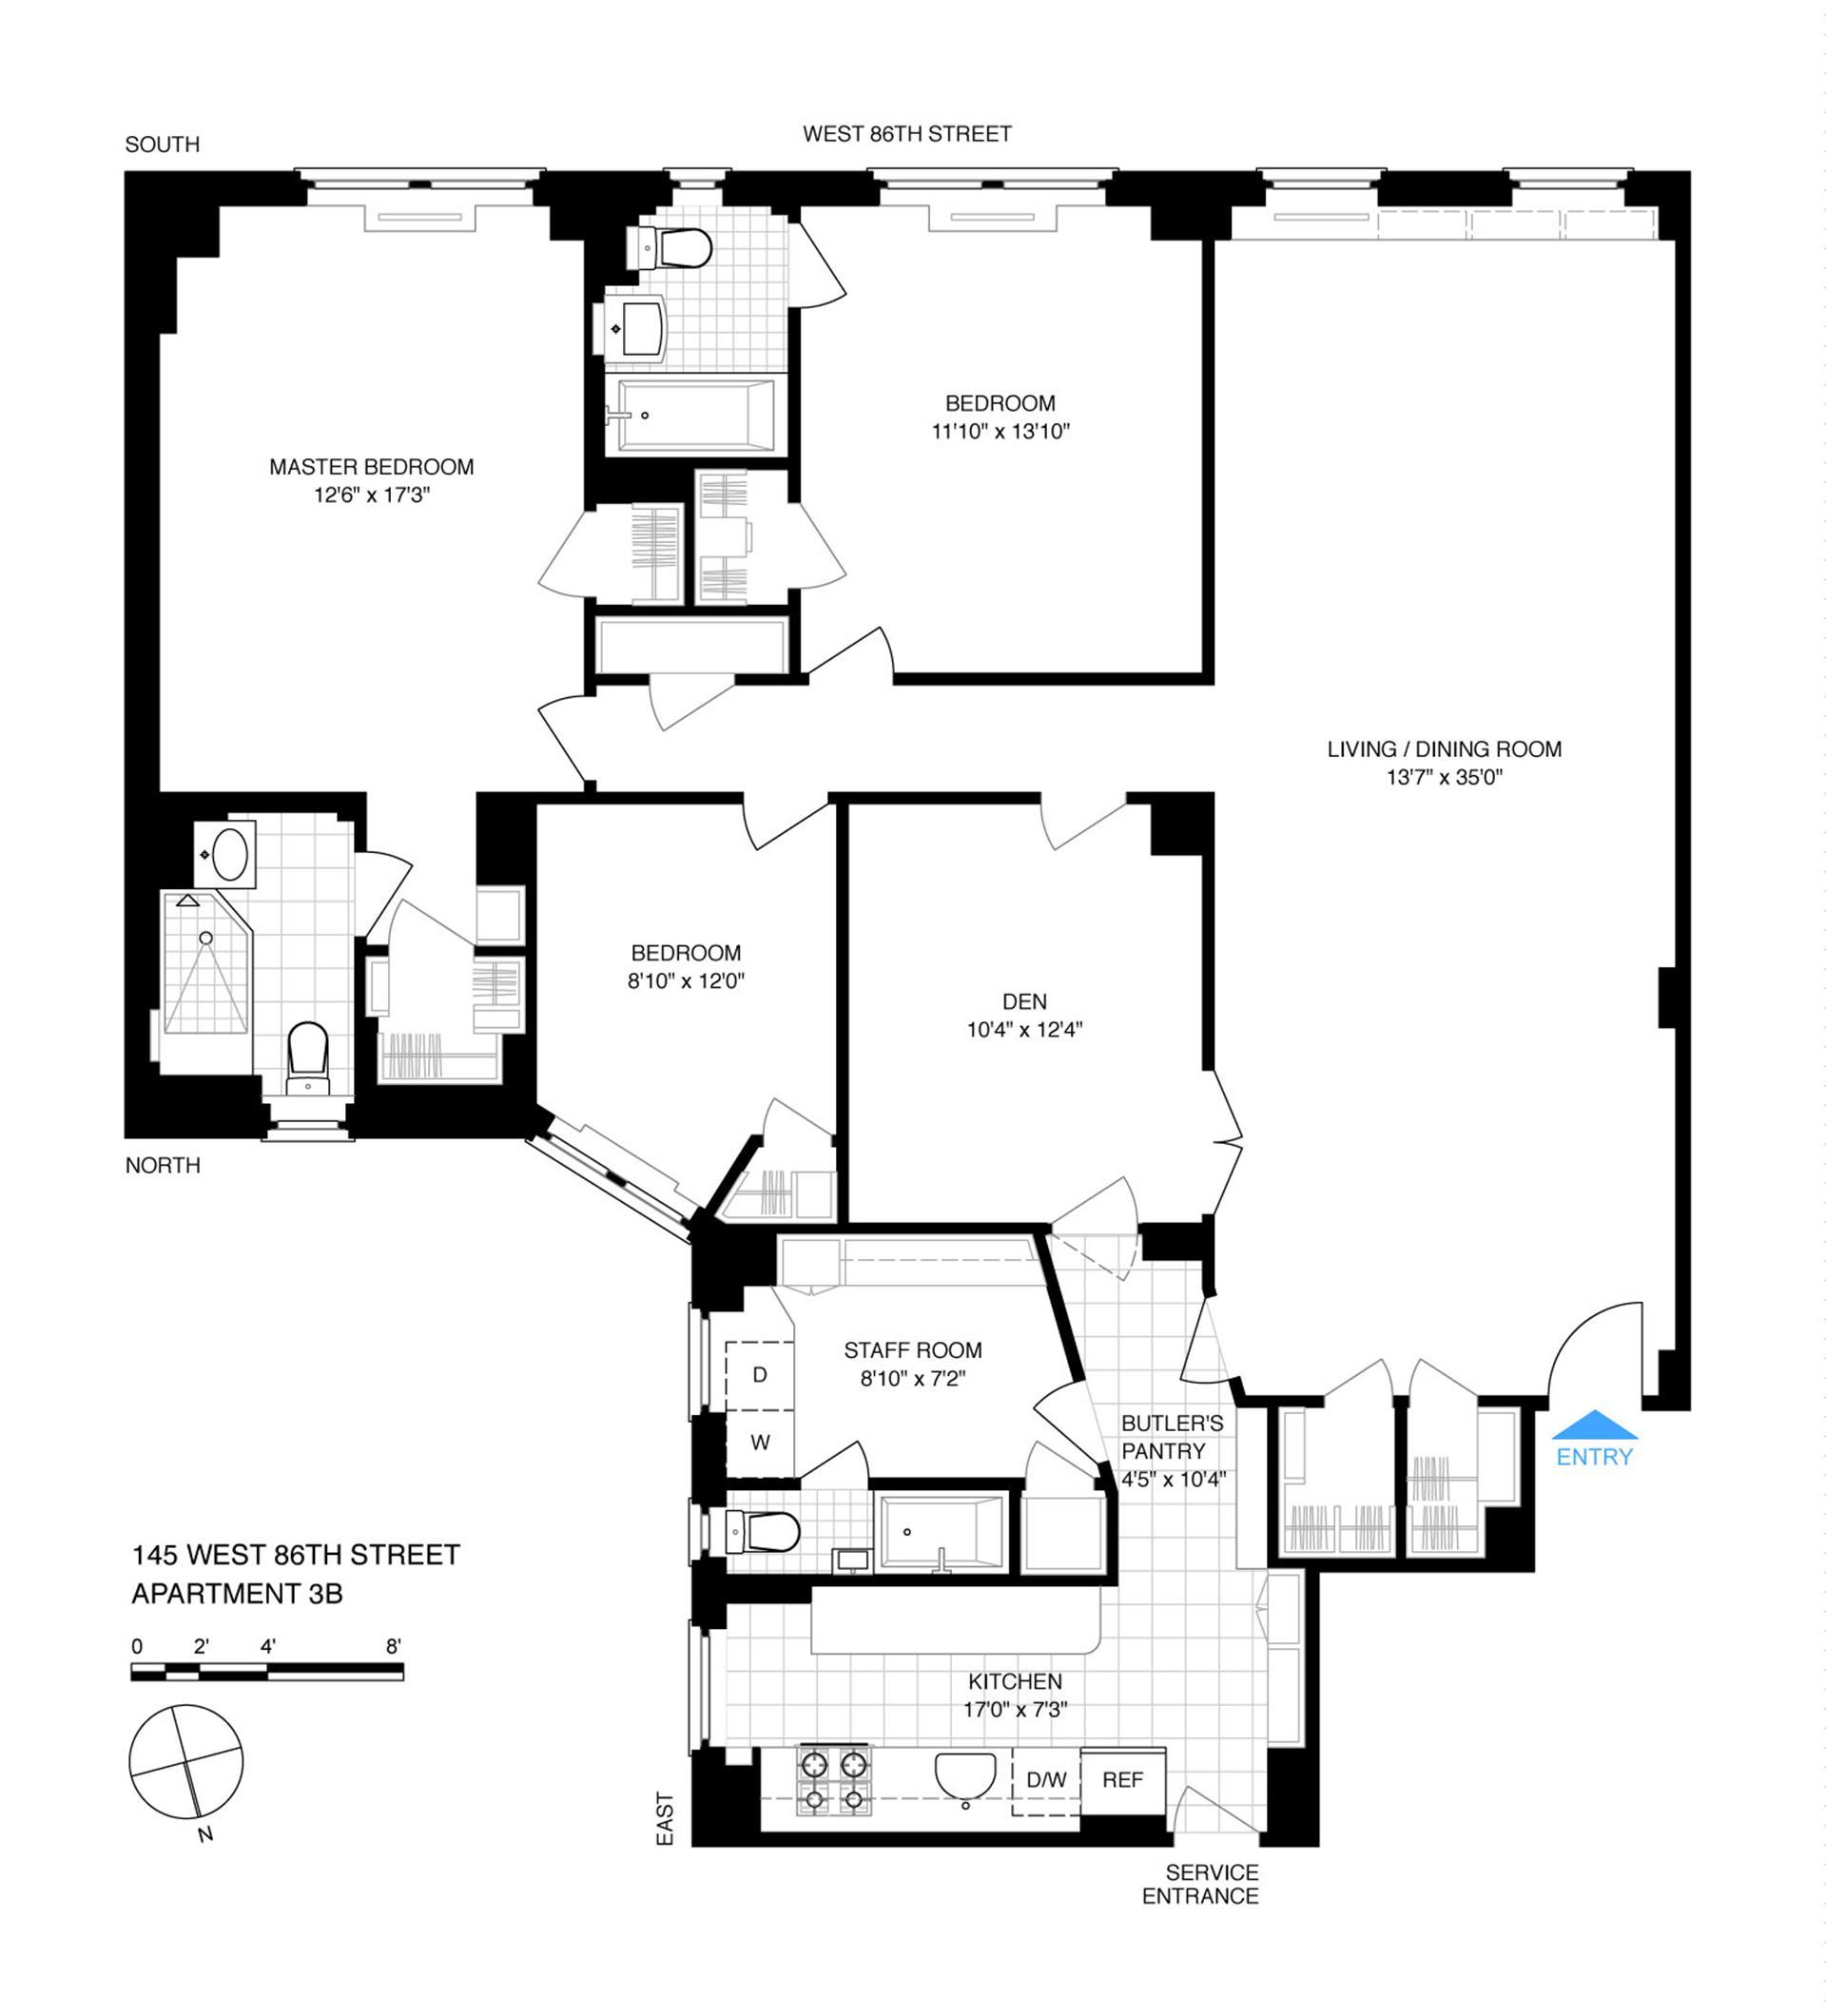 Floor plan of 145 West 86th St, 3B - Upper West Side, New York